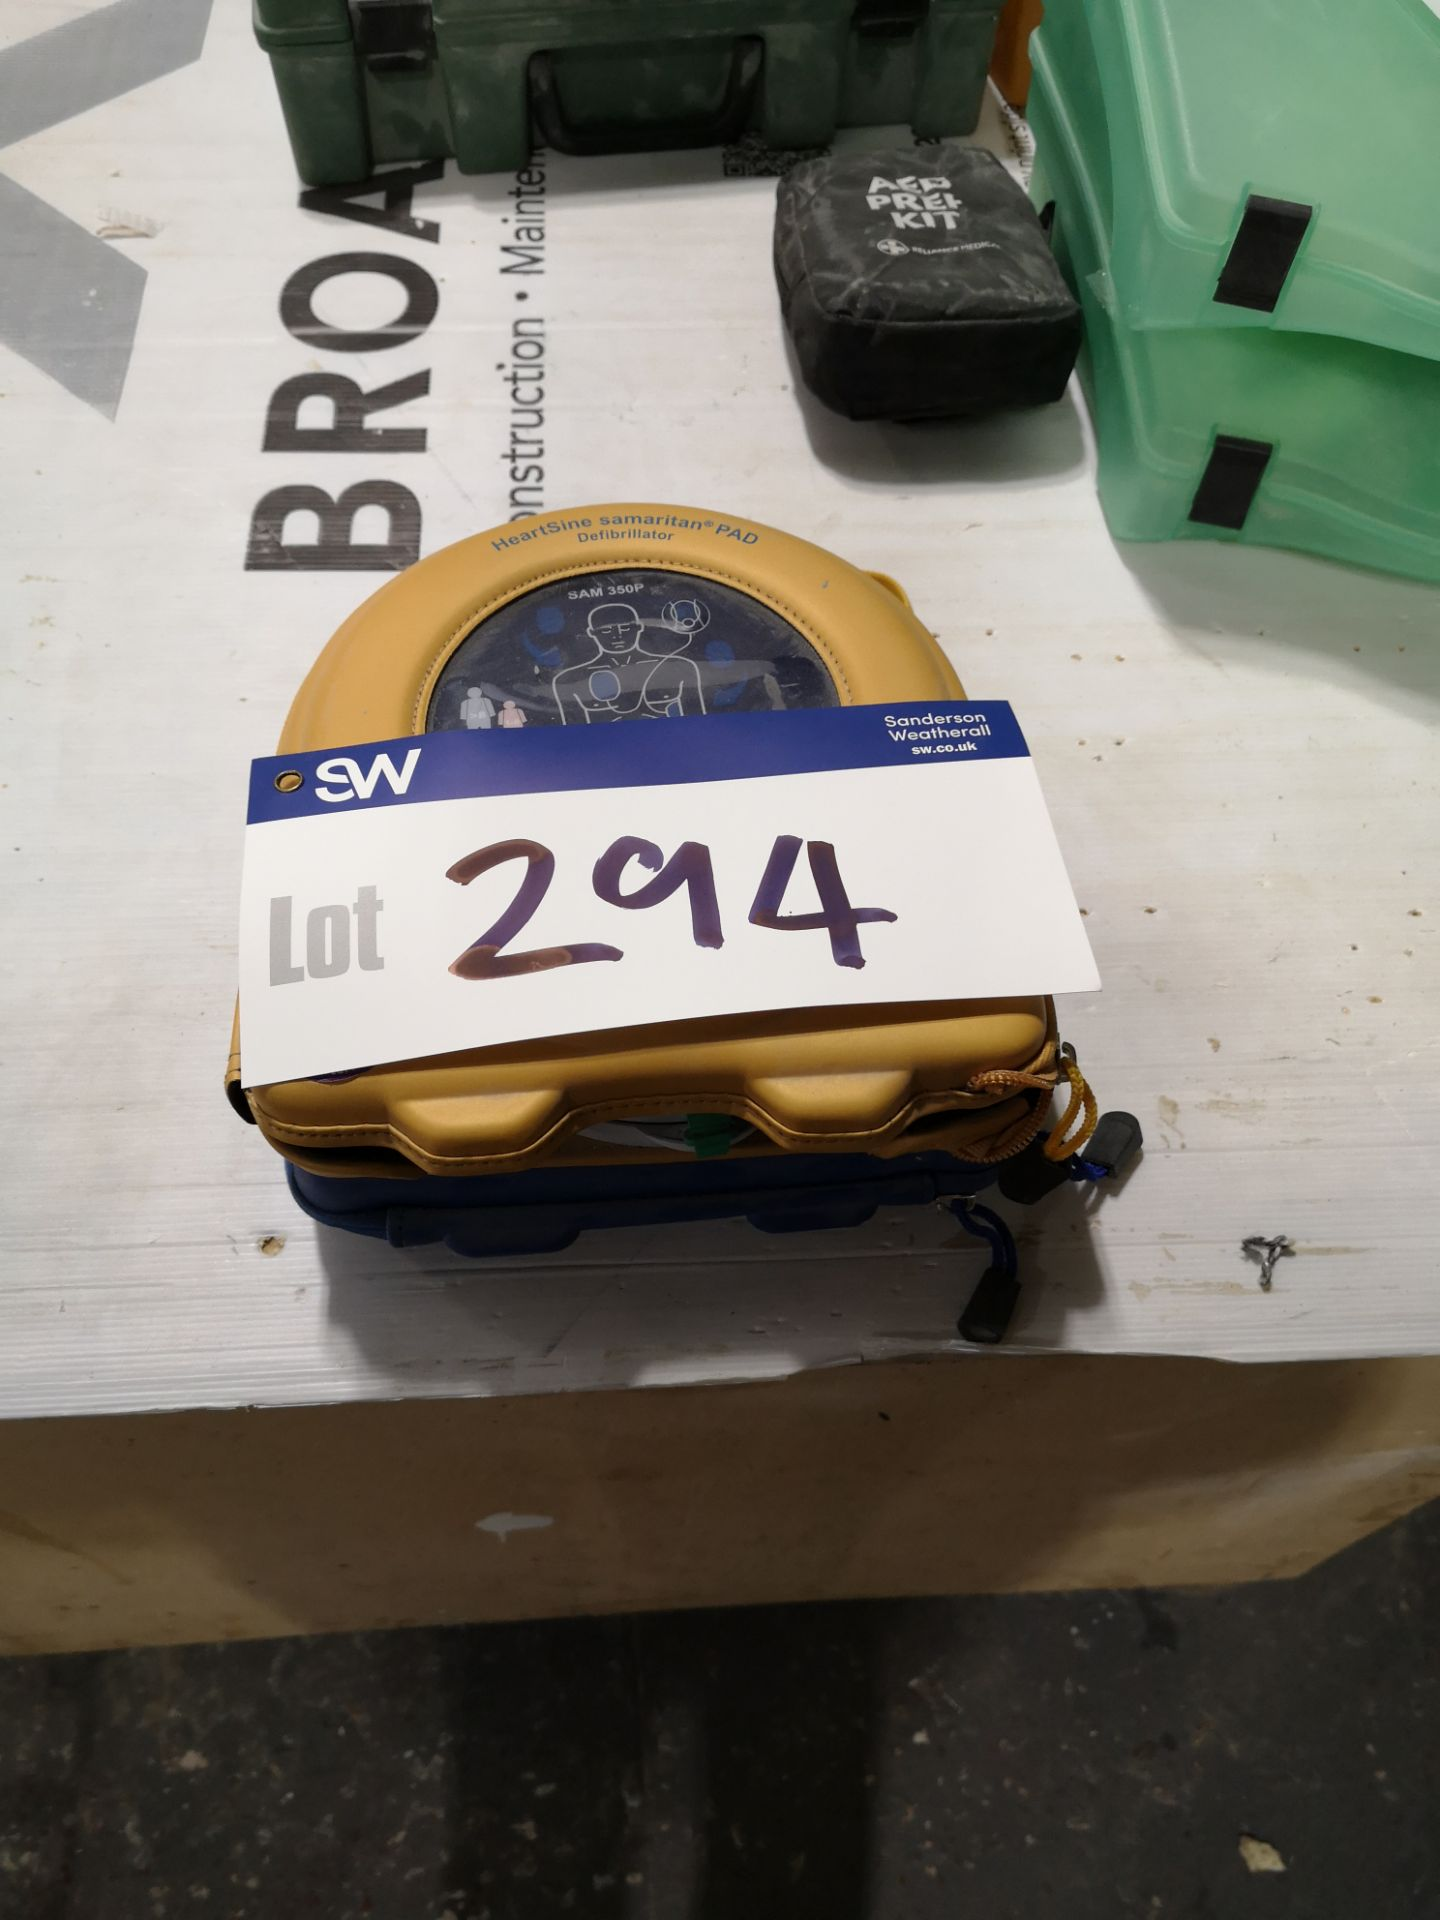 Lot 294 - Heartsine Samaritan PAD Defibrillator